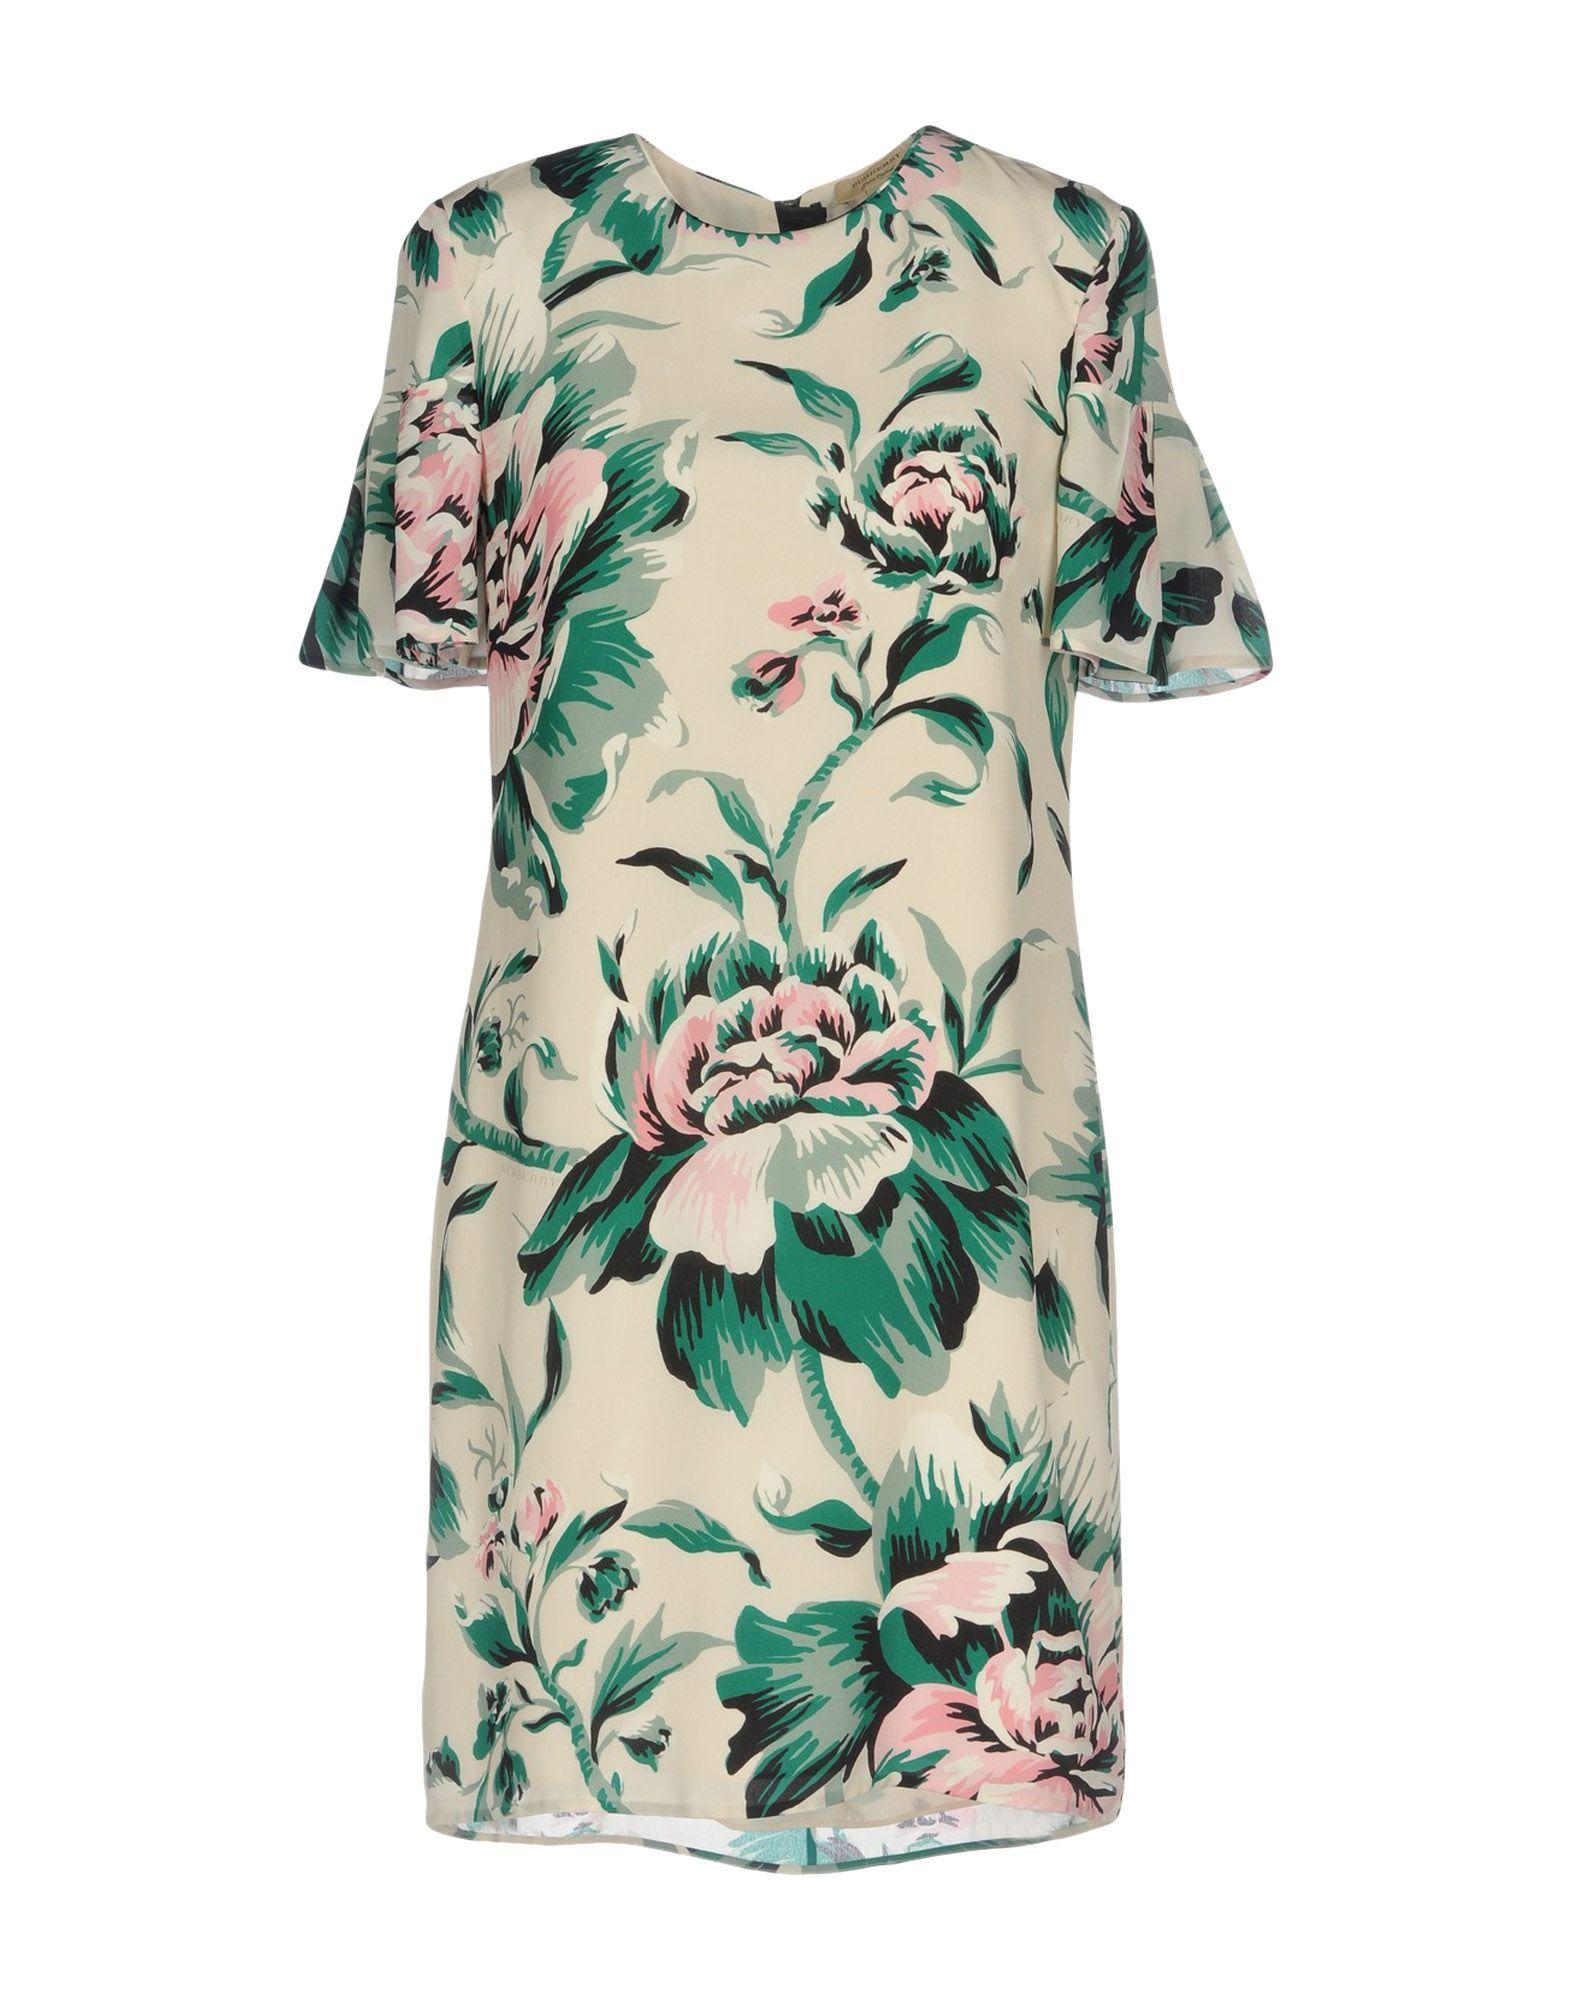 13b8cfb47a BURBERRY - Γυναικεία Κοντά Φορέματα - Yoox